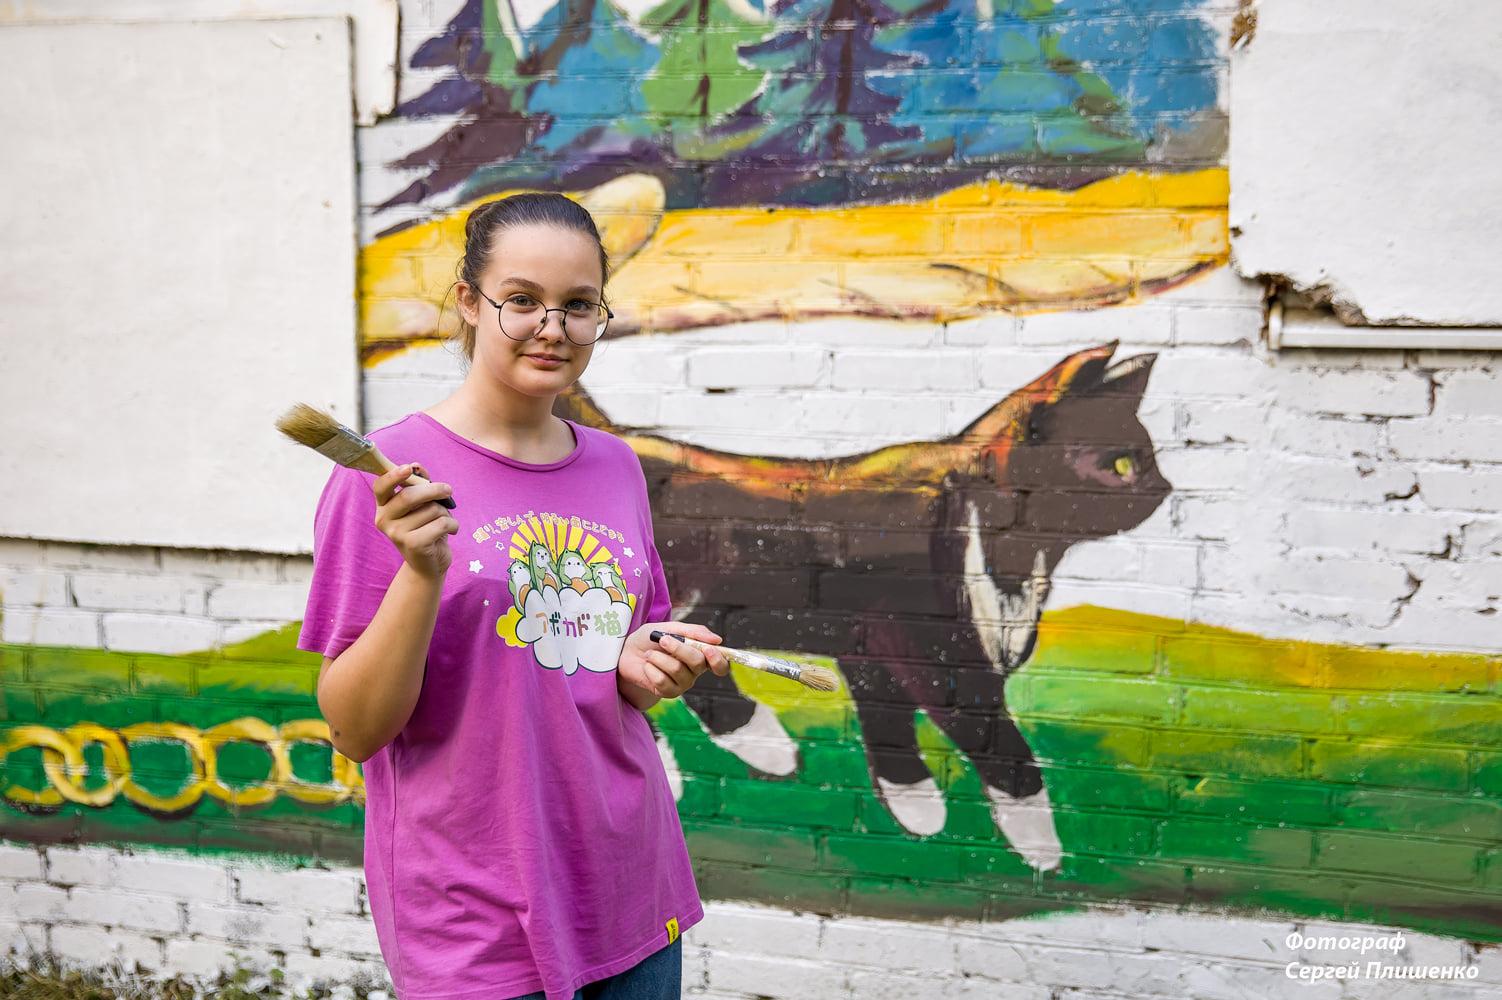 Фестиваль граффити в Таганроге: подробности